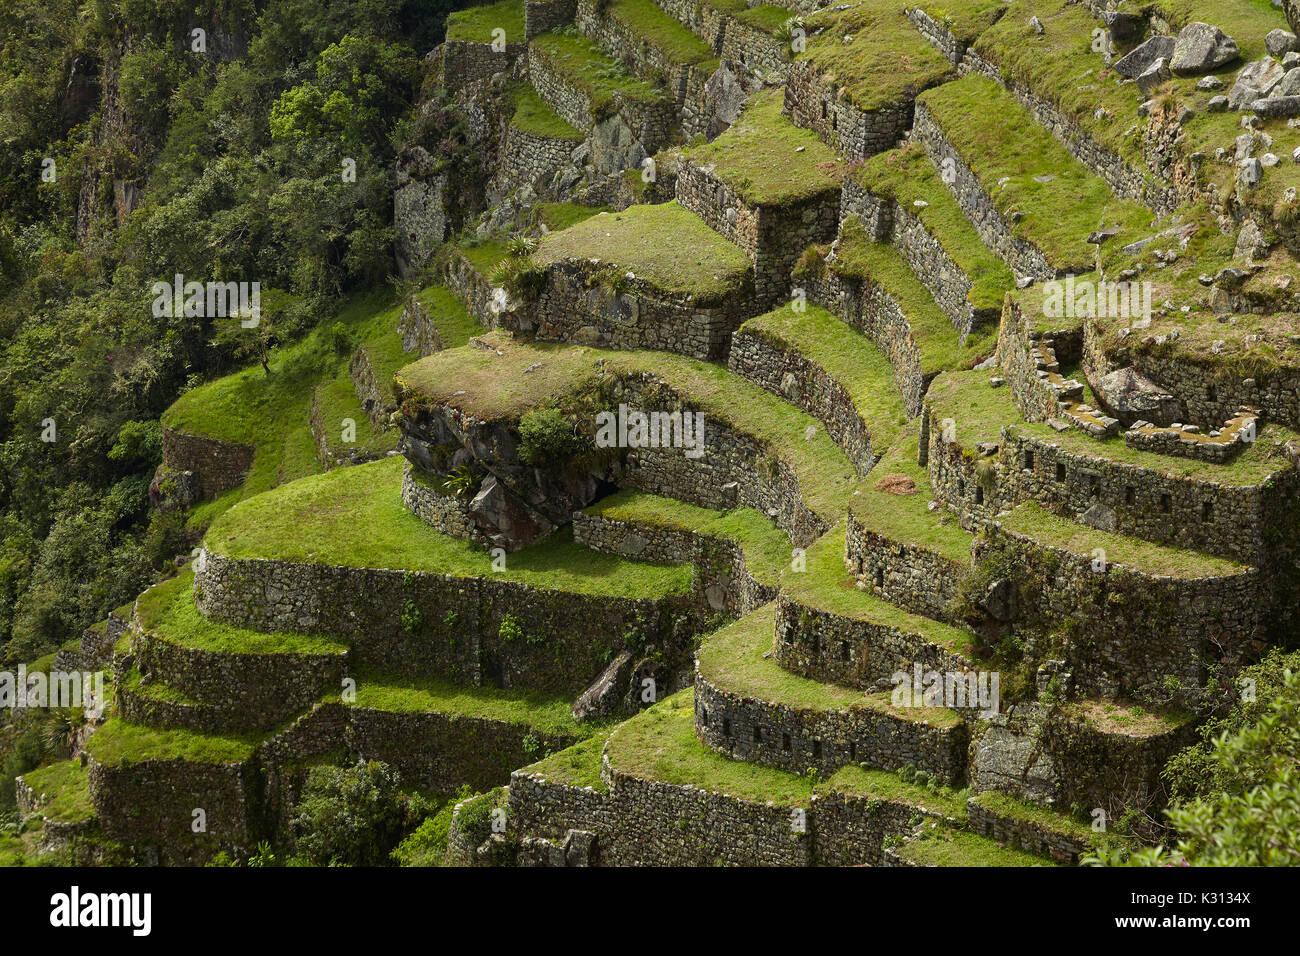 Cultivation Terraces Machu Picchu World Heritage Site